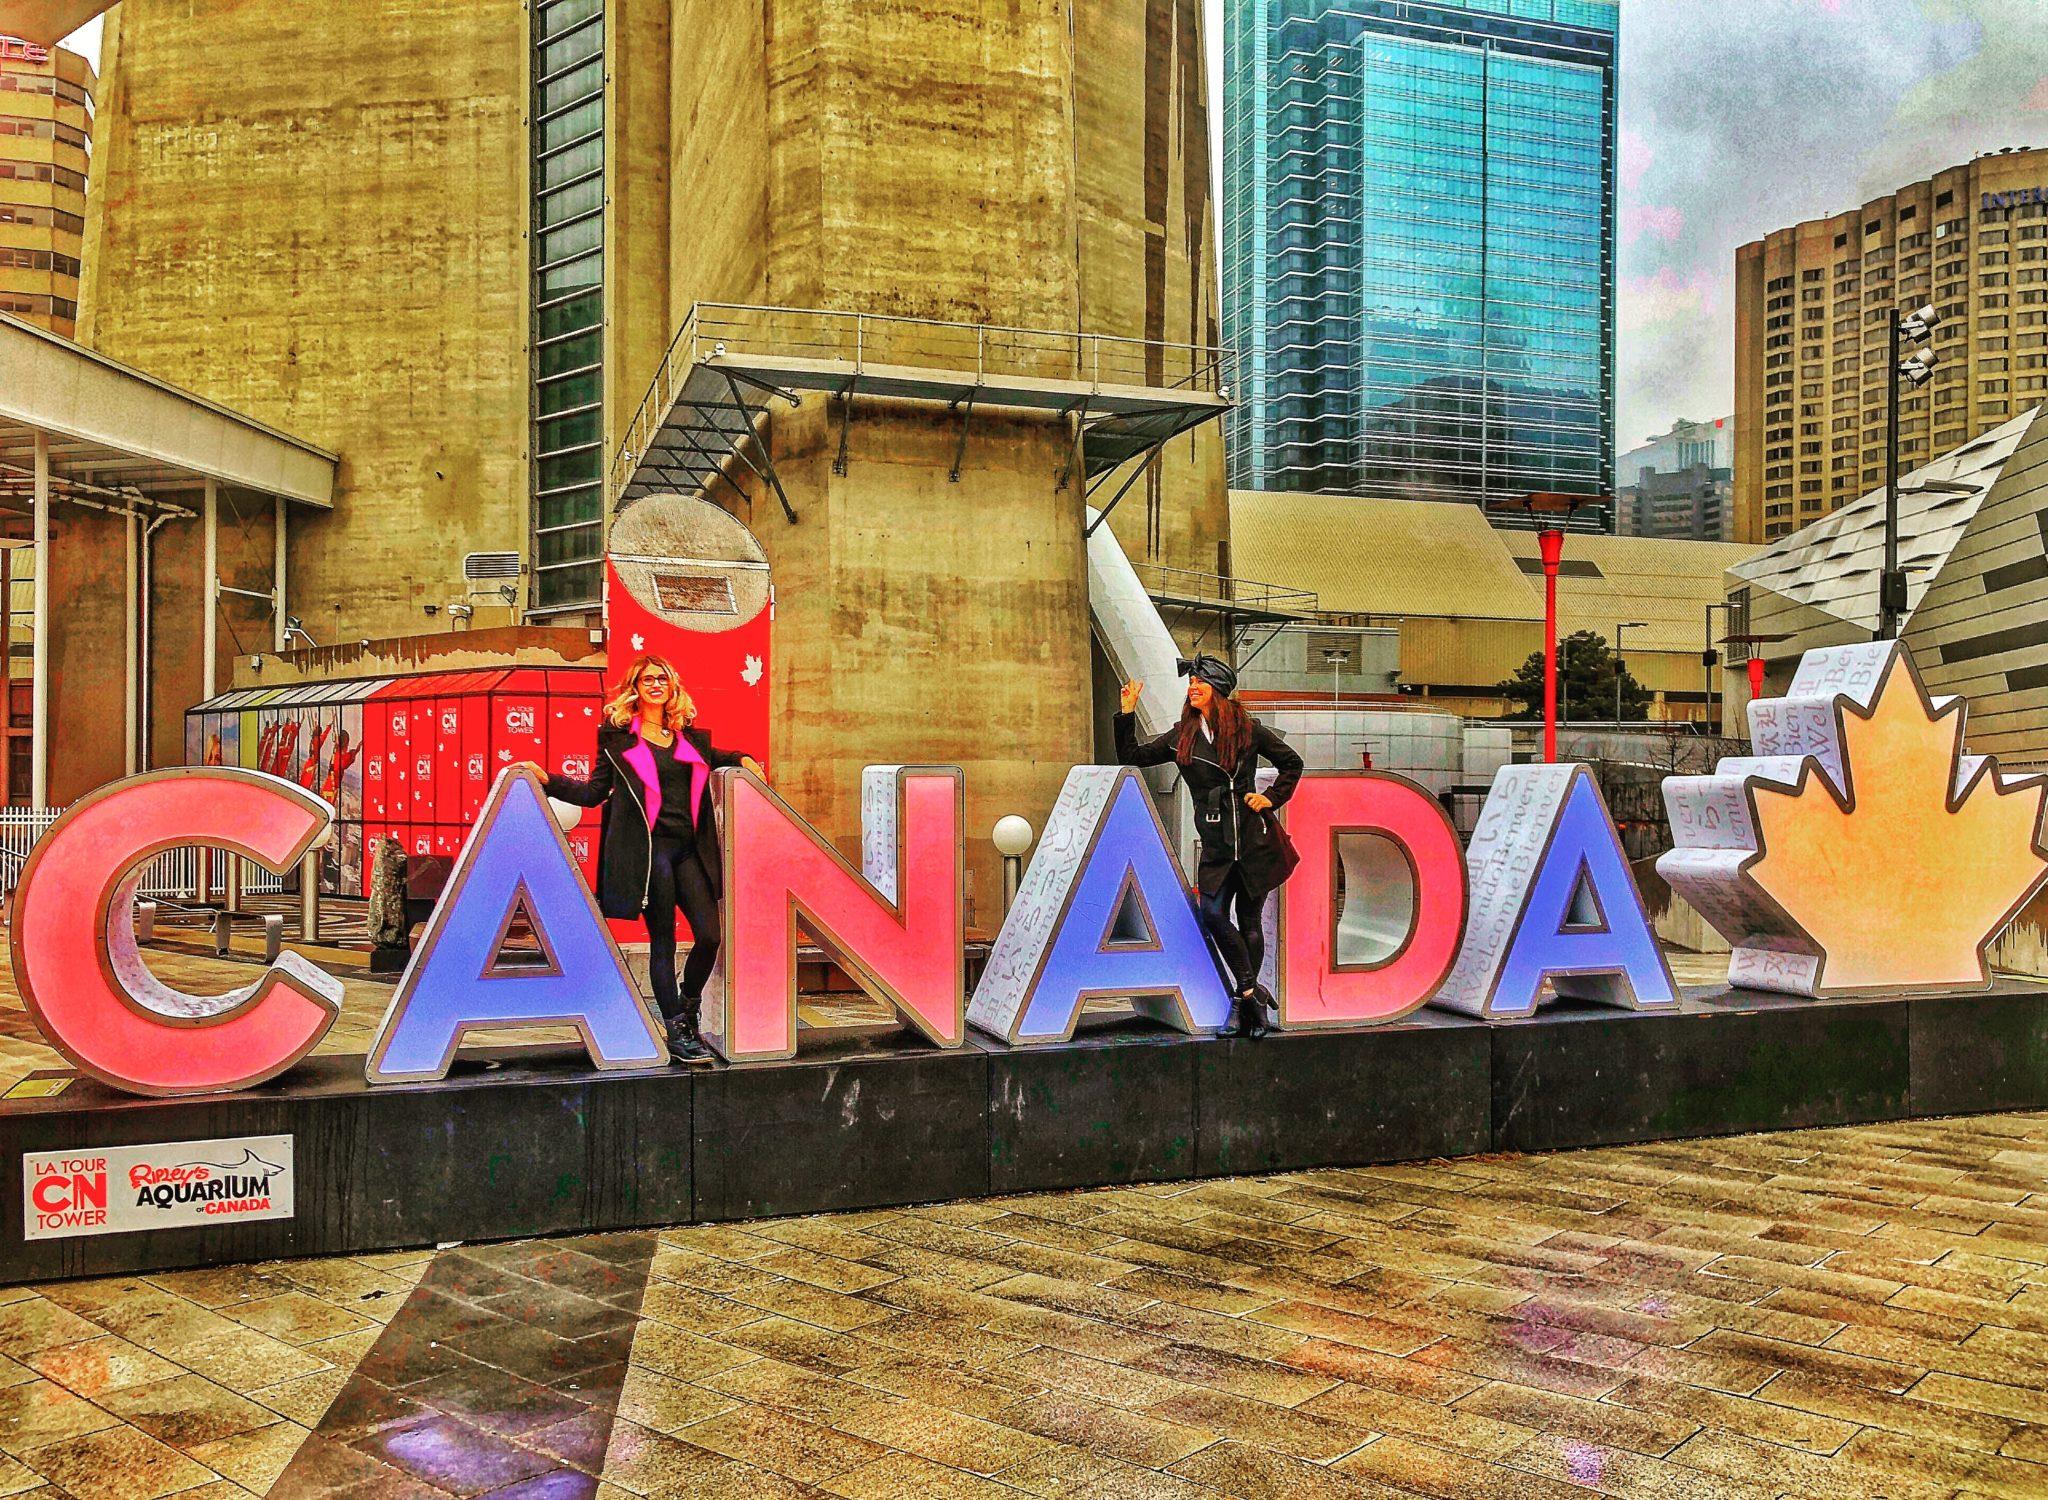 Canada Sign Toronto